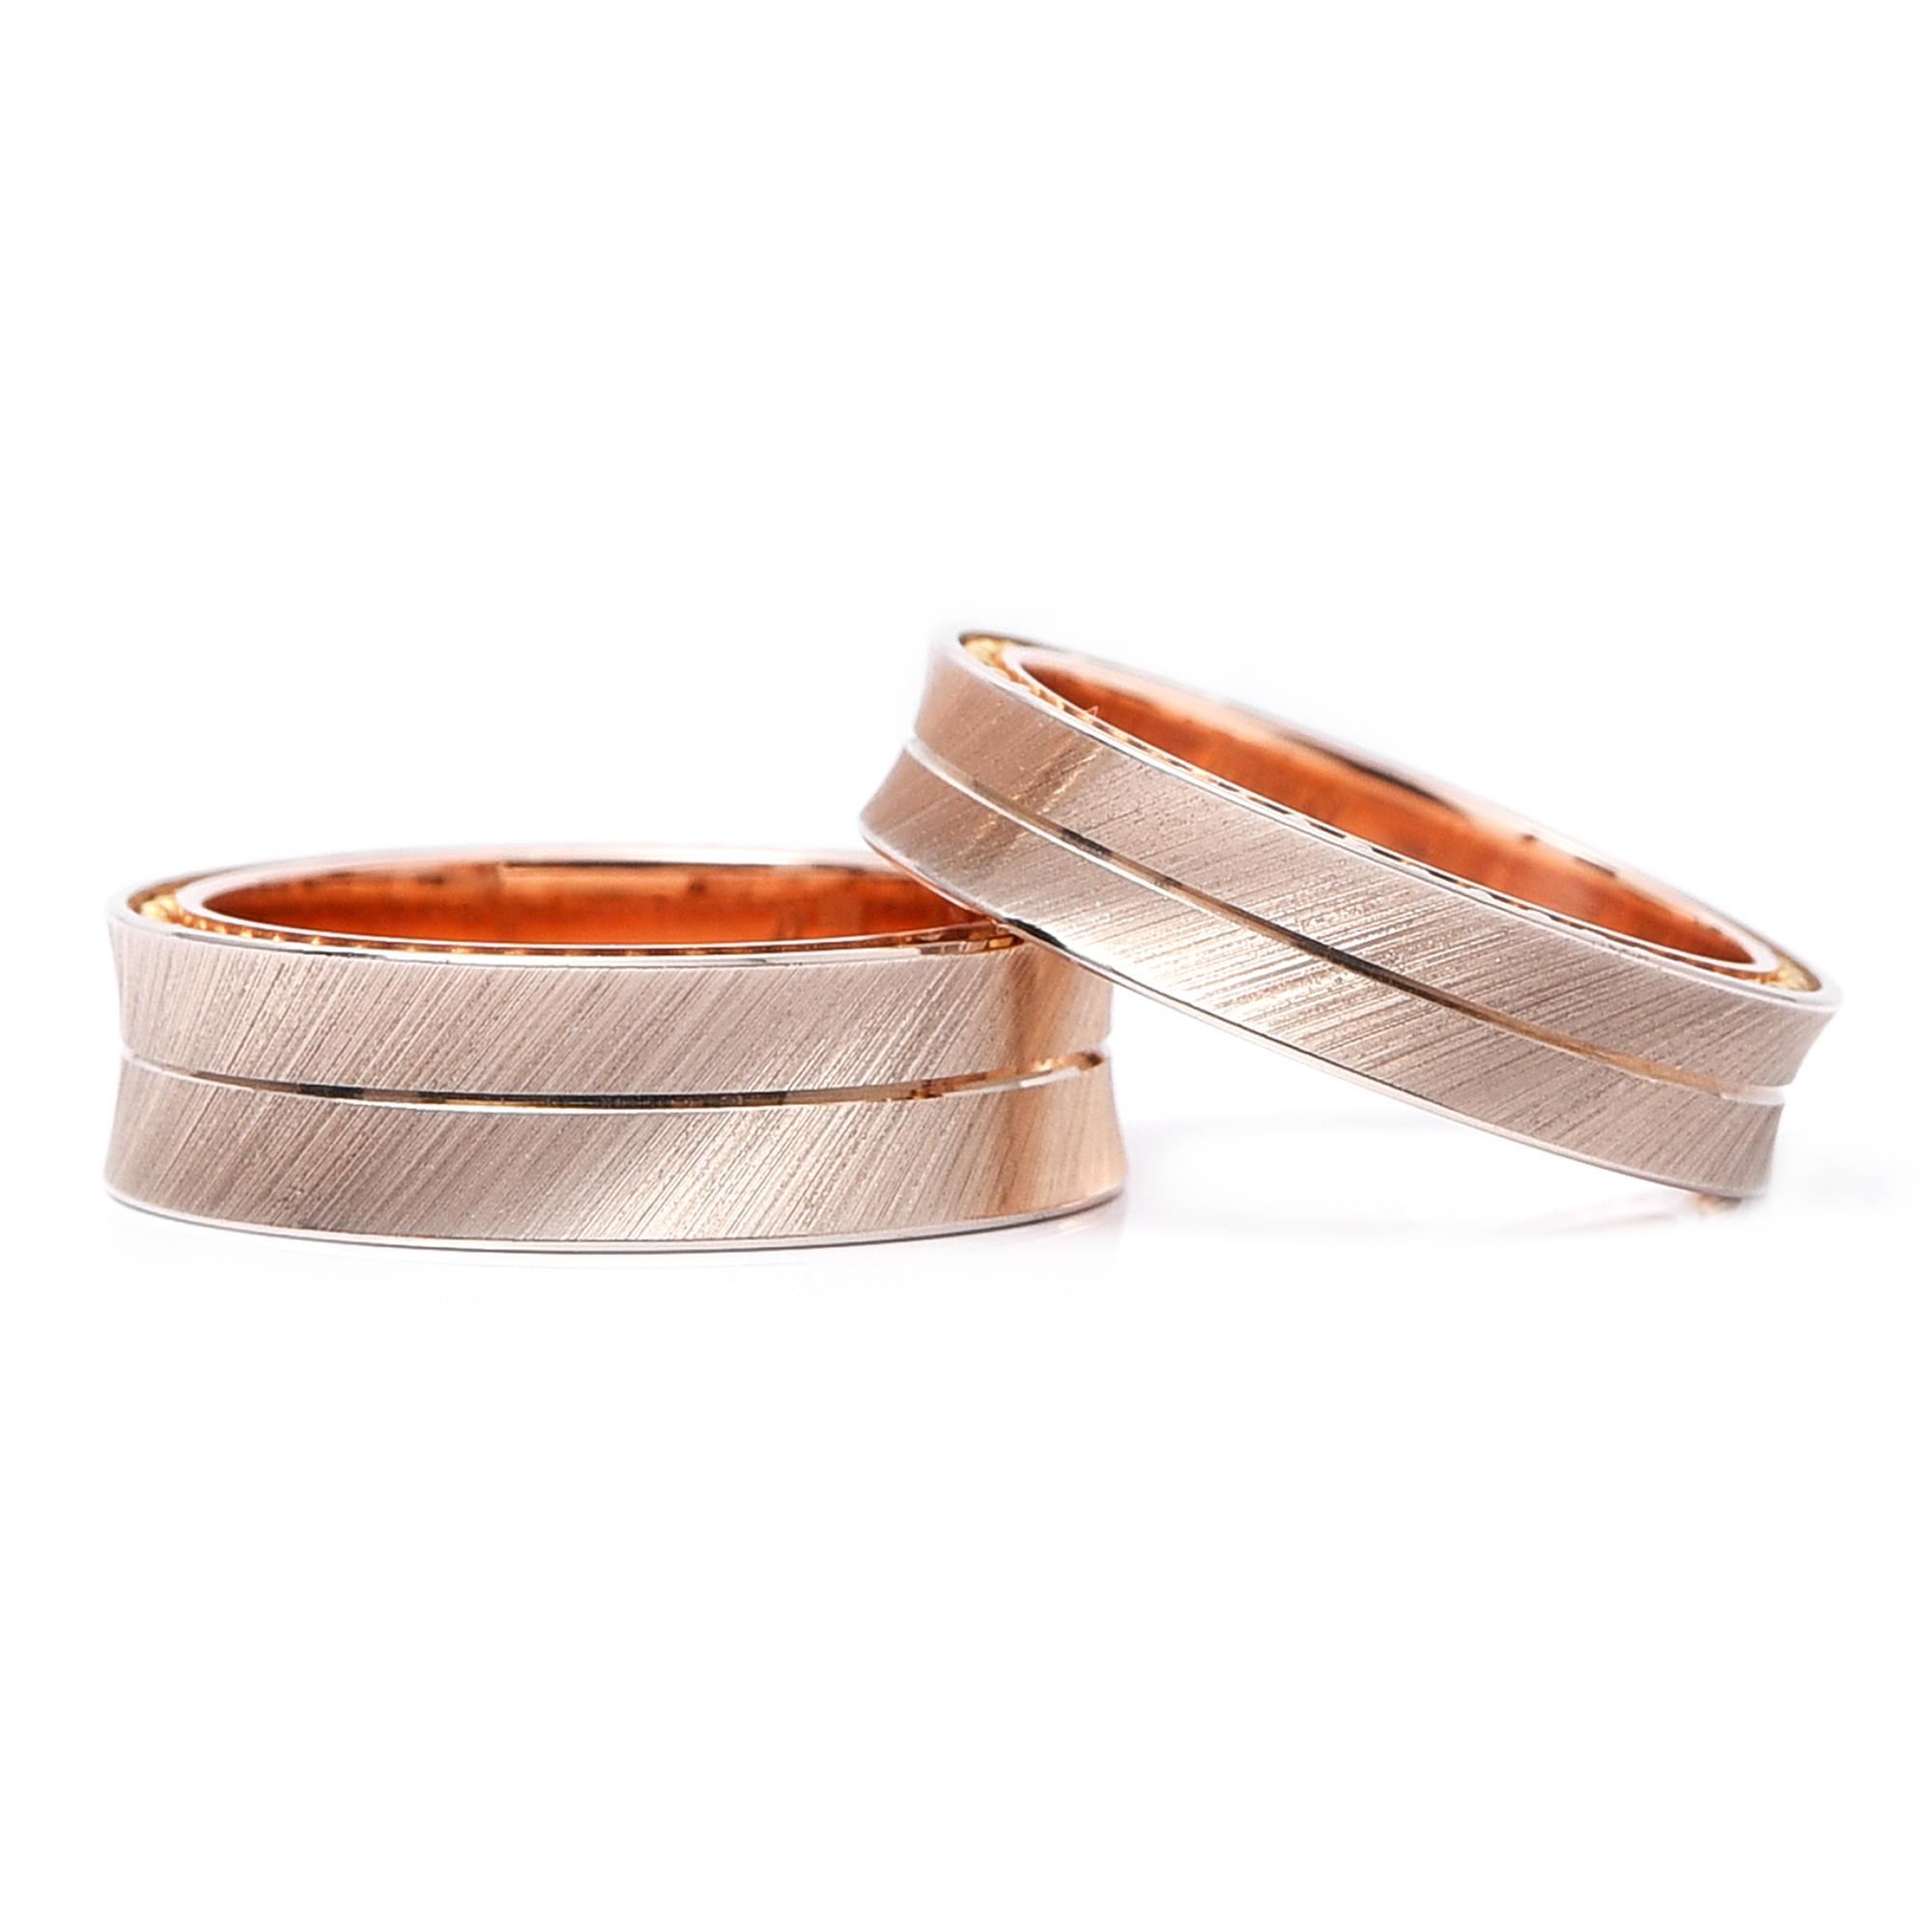 輪高崎工房の結婚指輪|HR-37